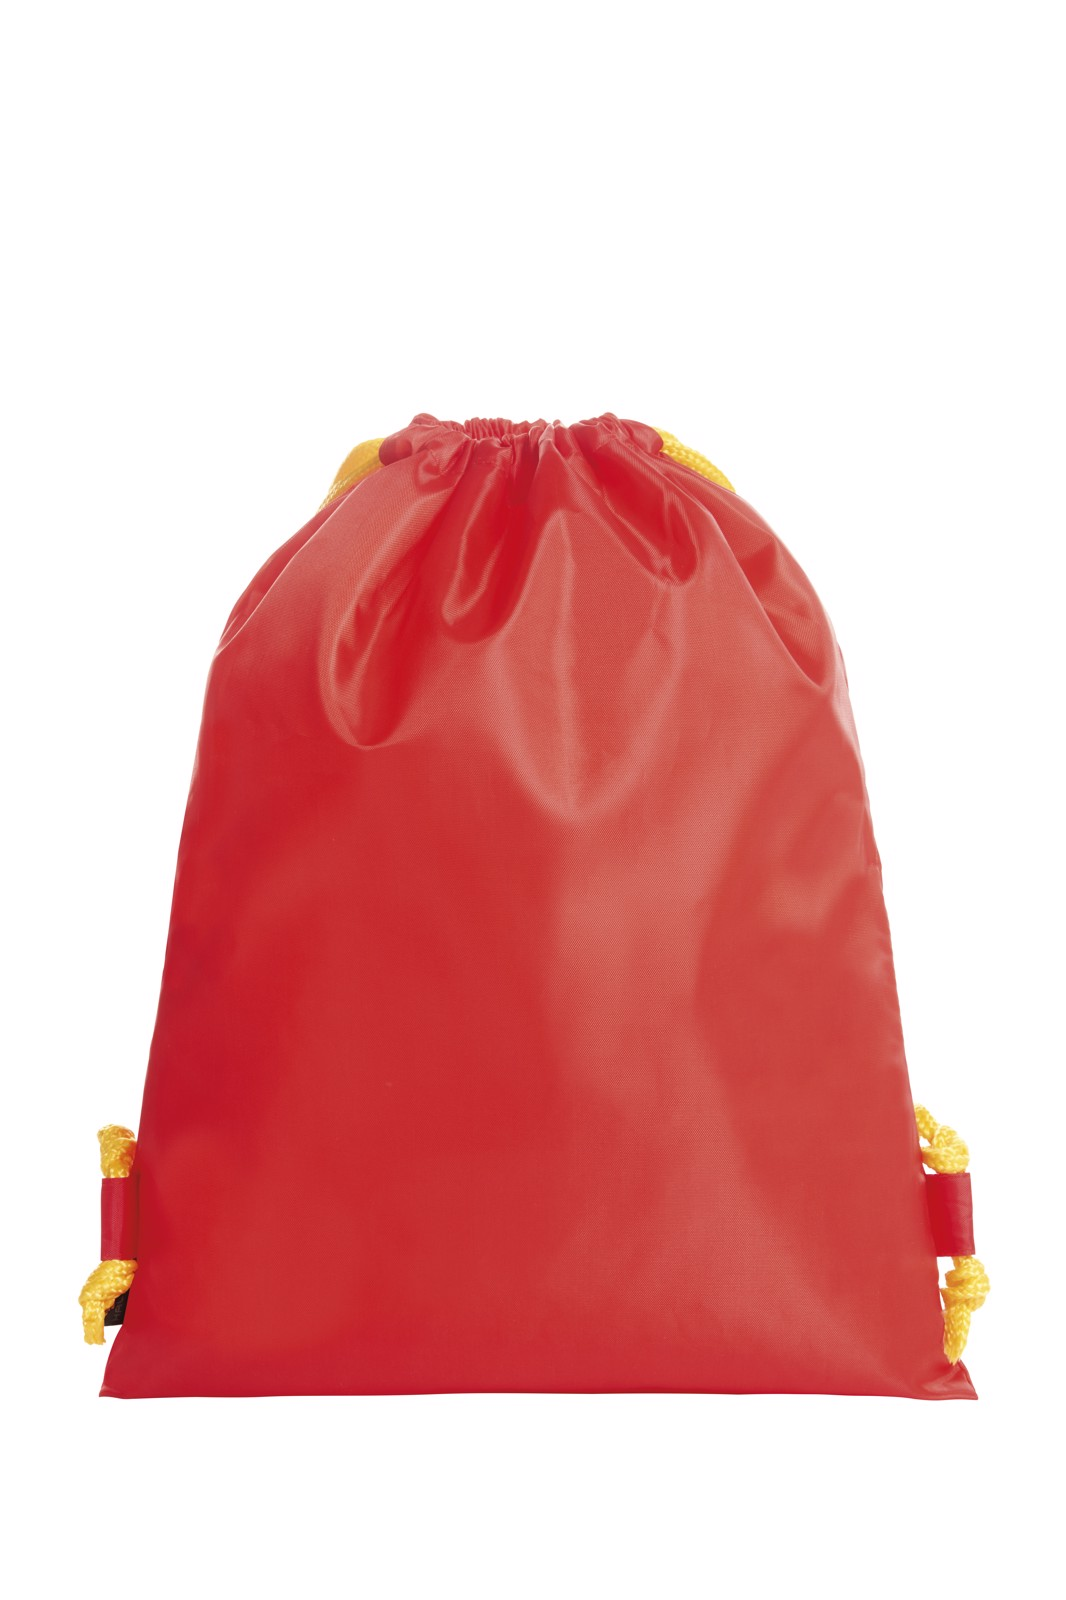 Batoh Taft Paint - Červená-Žlutá